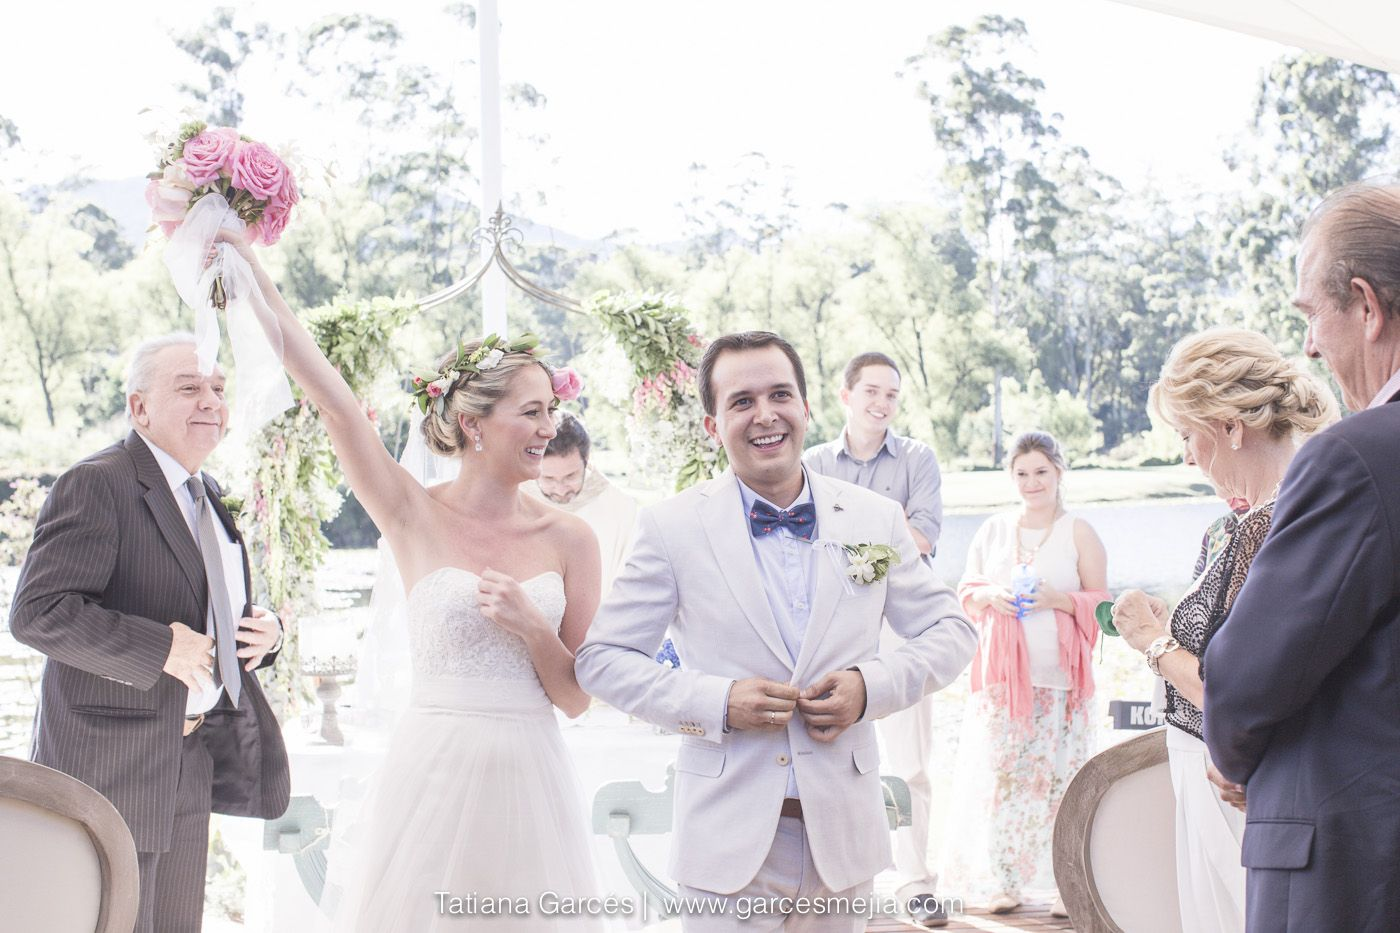 Bodas de dia, Bodas al aire libre, wedding, matrimonio, the most romantic - bodas - matrimonios - love - photowedding - Tatiana Garcés fotografía de bodas y de el amor - Salida de la iglesia